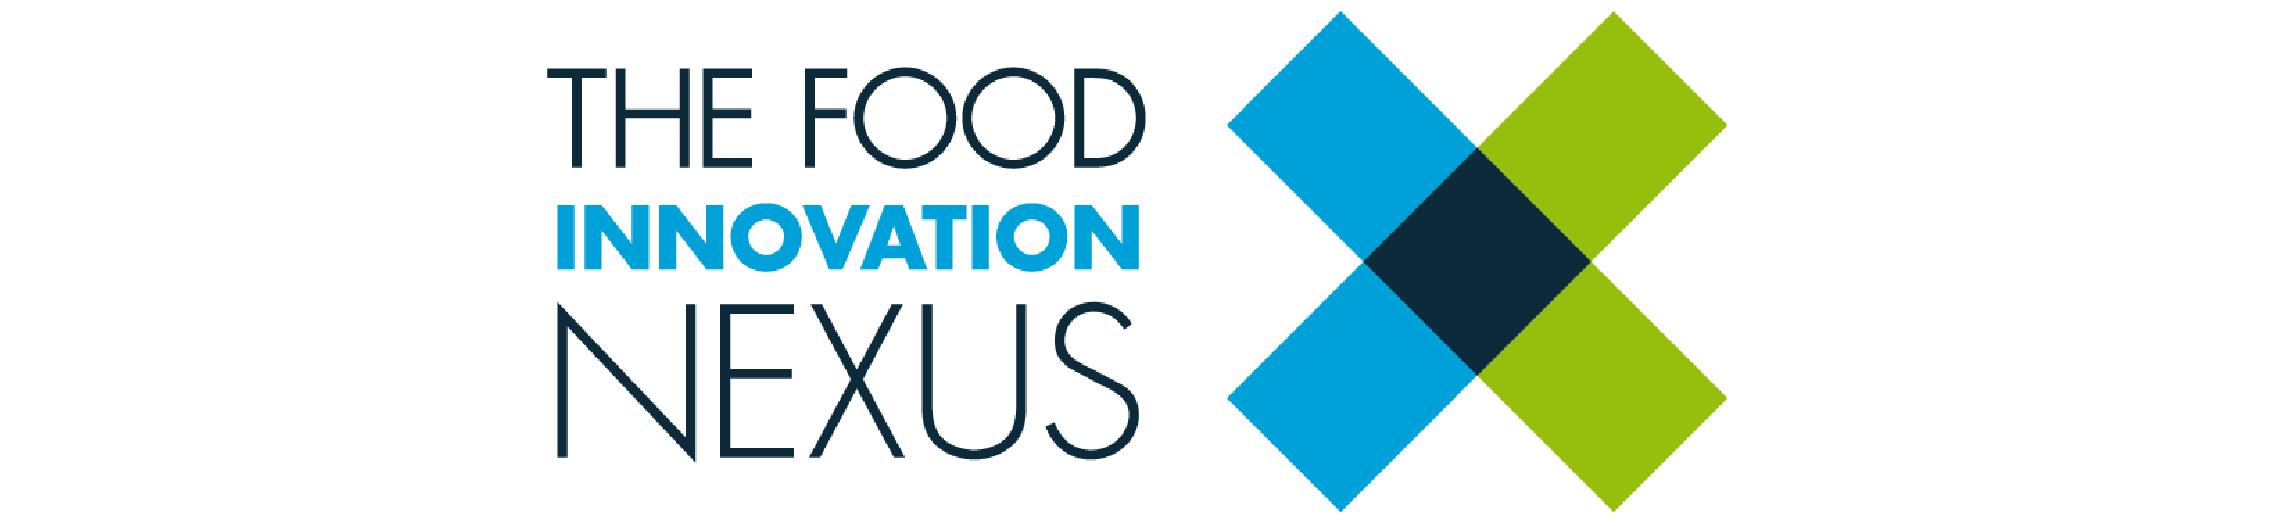 The Food Innovation Nexus